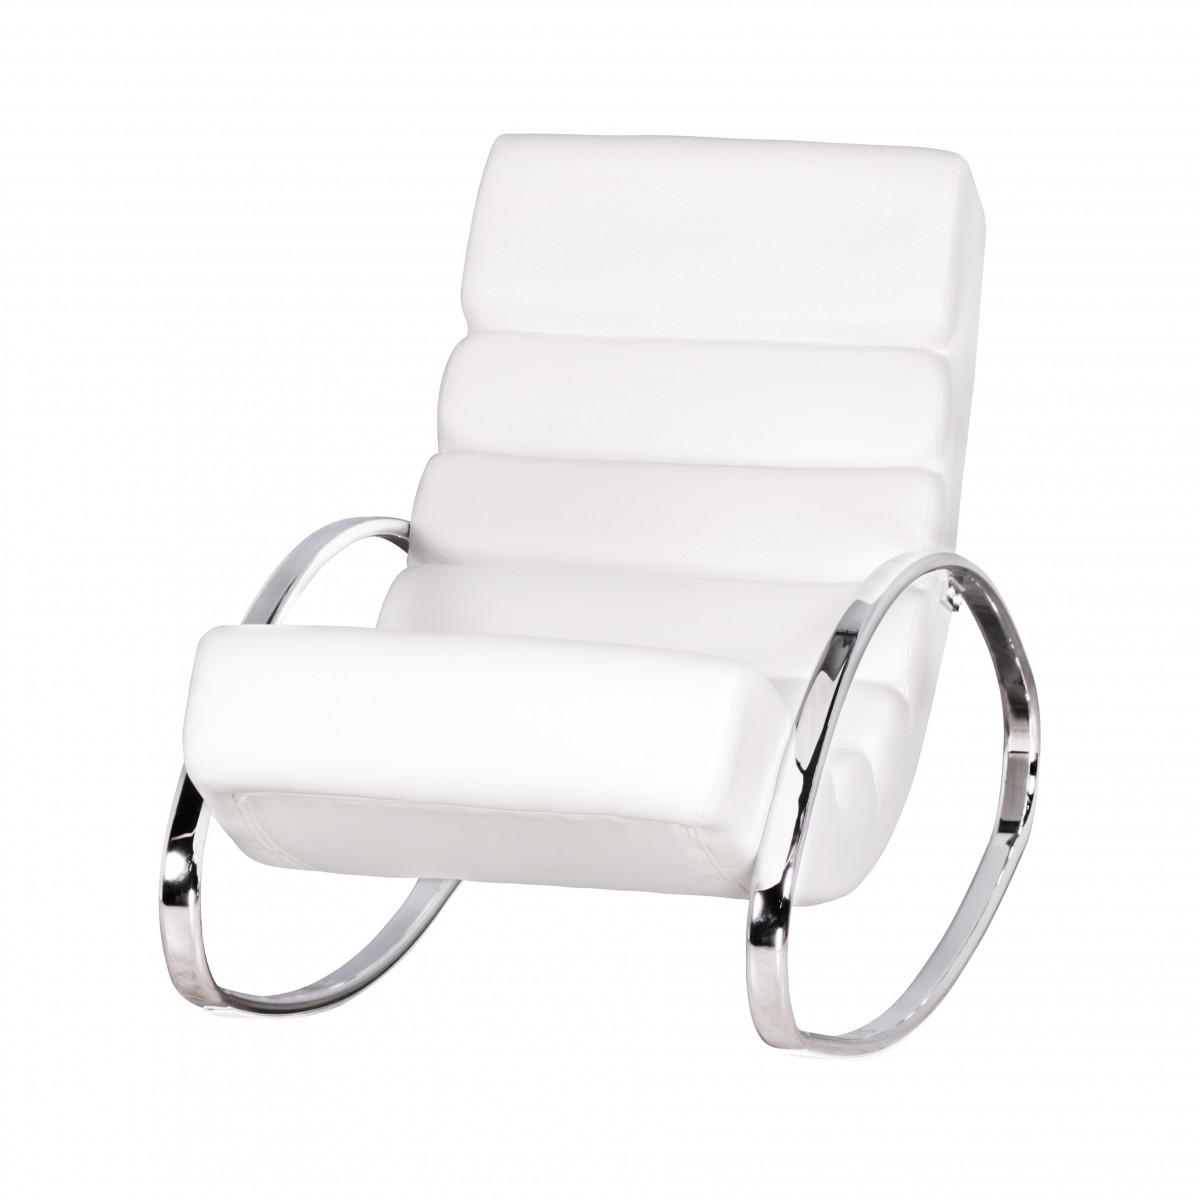 finebuy relaxliege sessel fernsehsessel relaxsessel design schaukelstuhl wippstuhl modern 43337. Black Bedroom Furniture Sets. Home Design Ideas